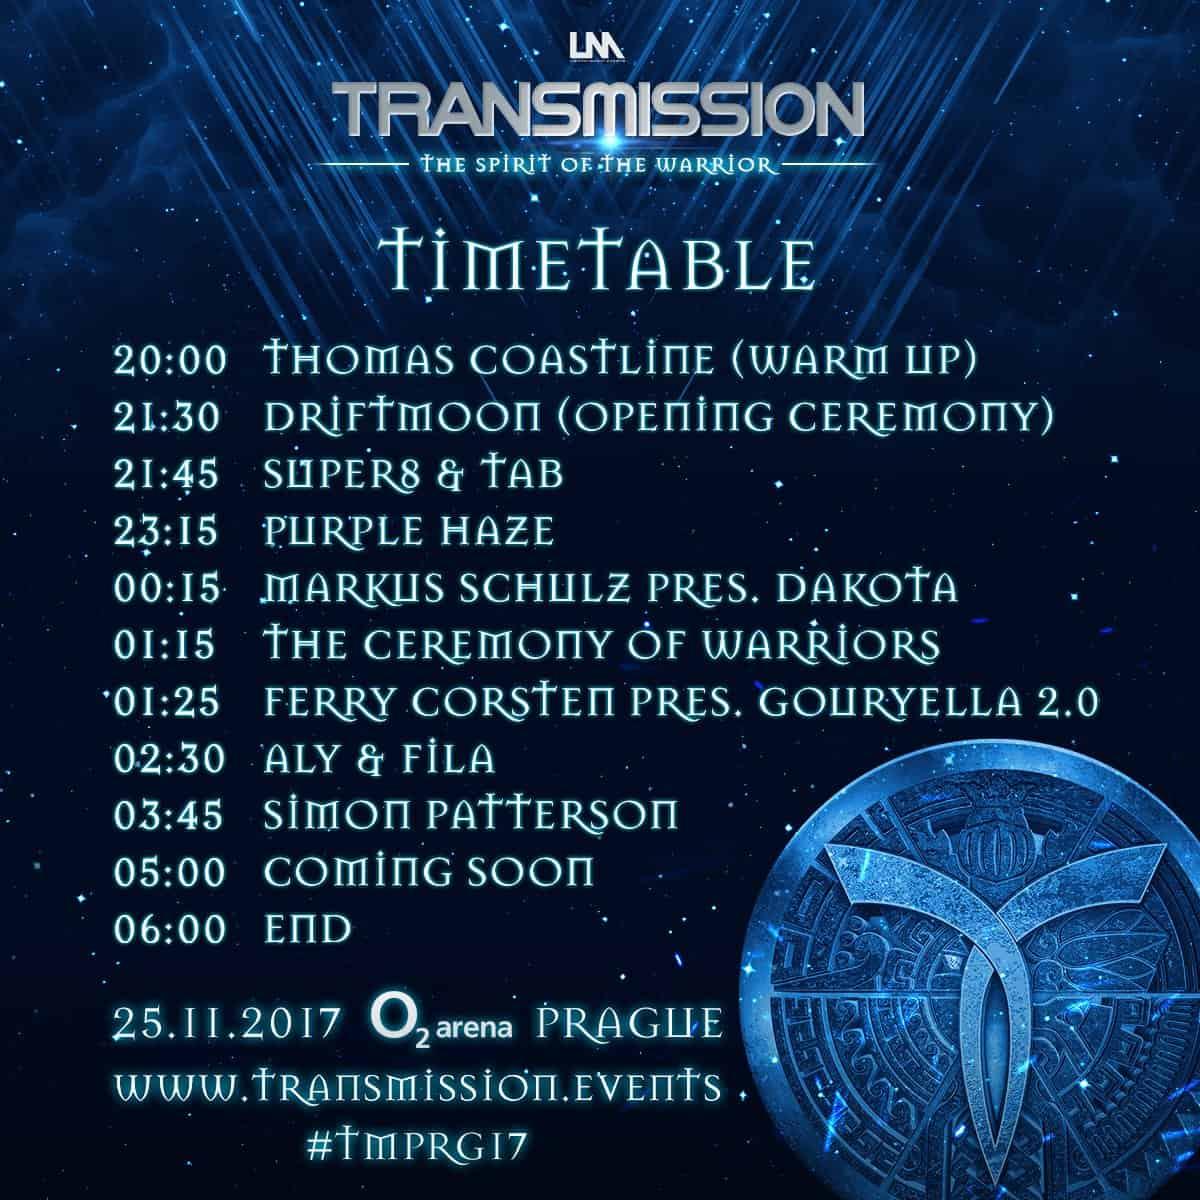 Timetable Transmission 2017